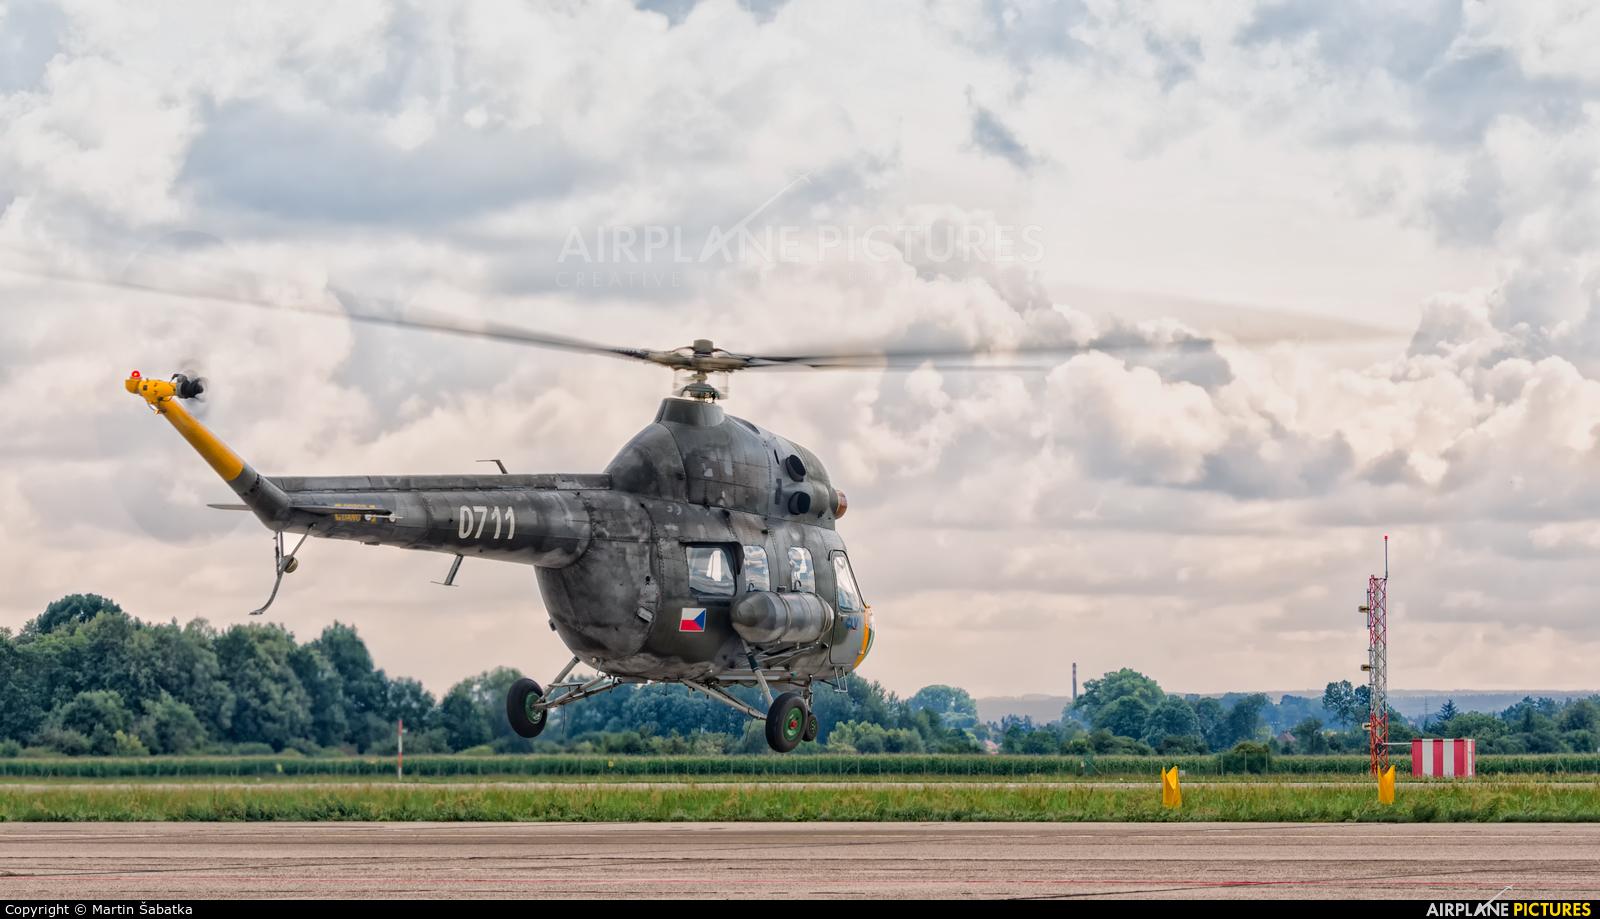 Czech - Air Force 0711 aircraft at Pardubice